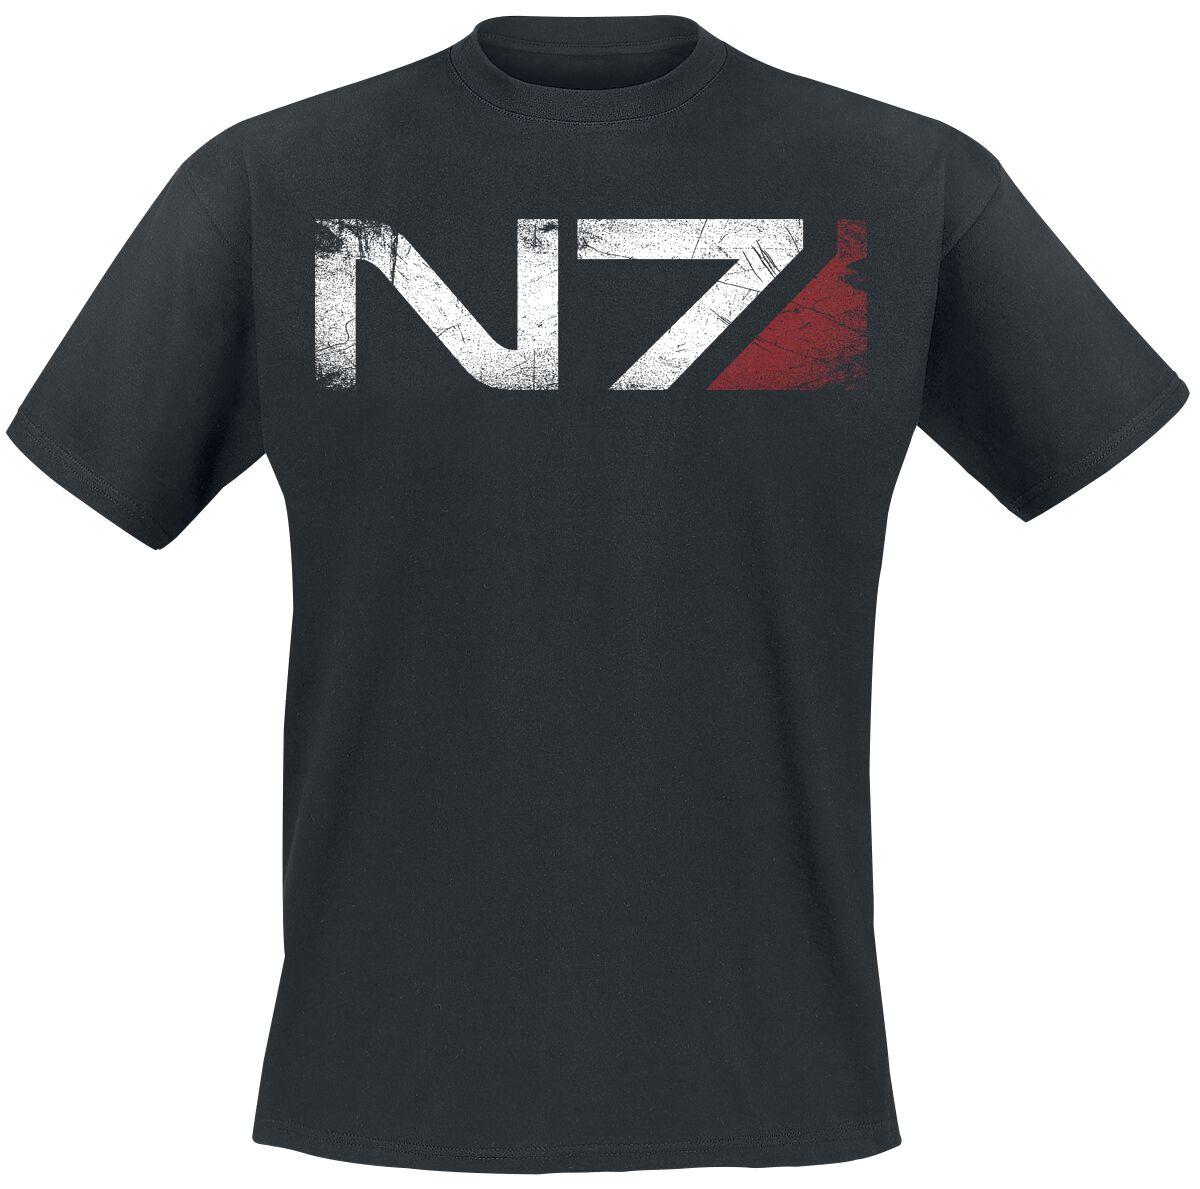 Merch dla Fanów - Koszulki - T-Shirt Mass Effect Andromeda - N7 T-Shirt czarny - 355334